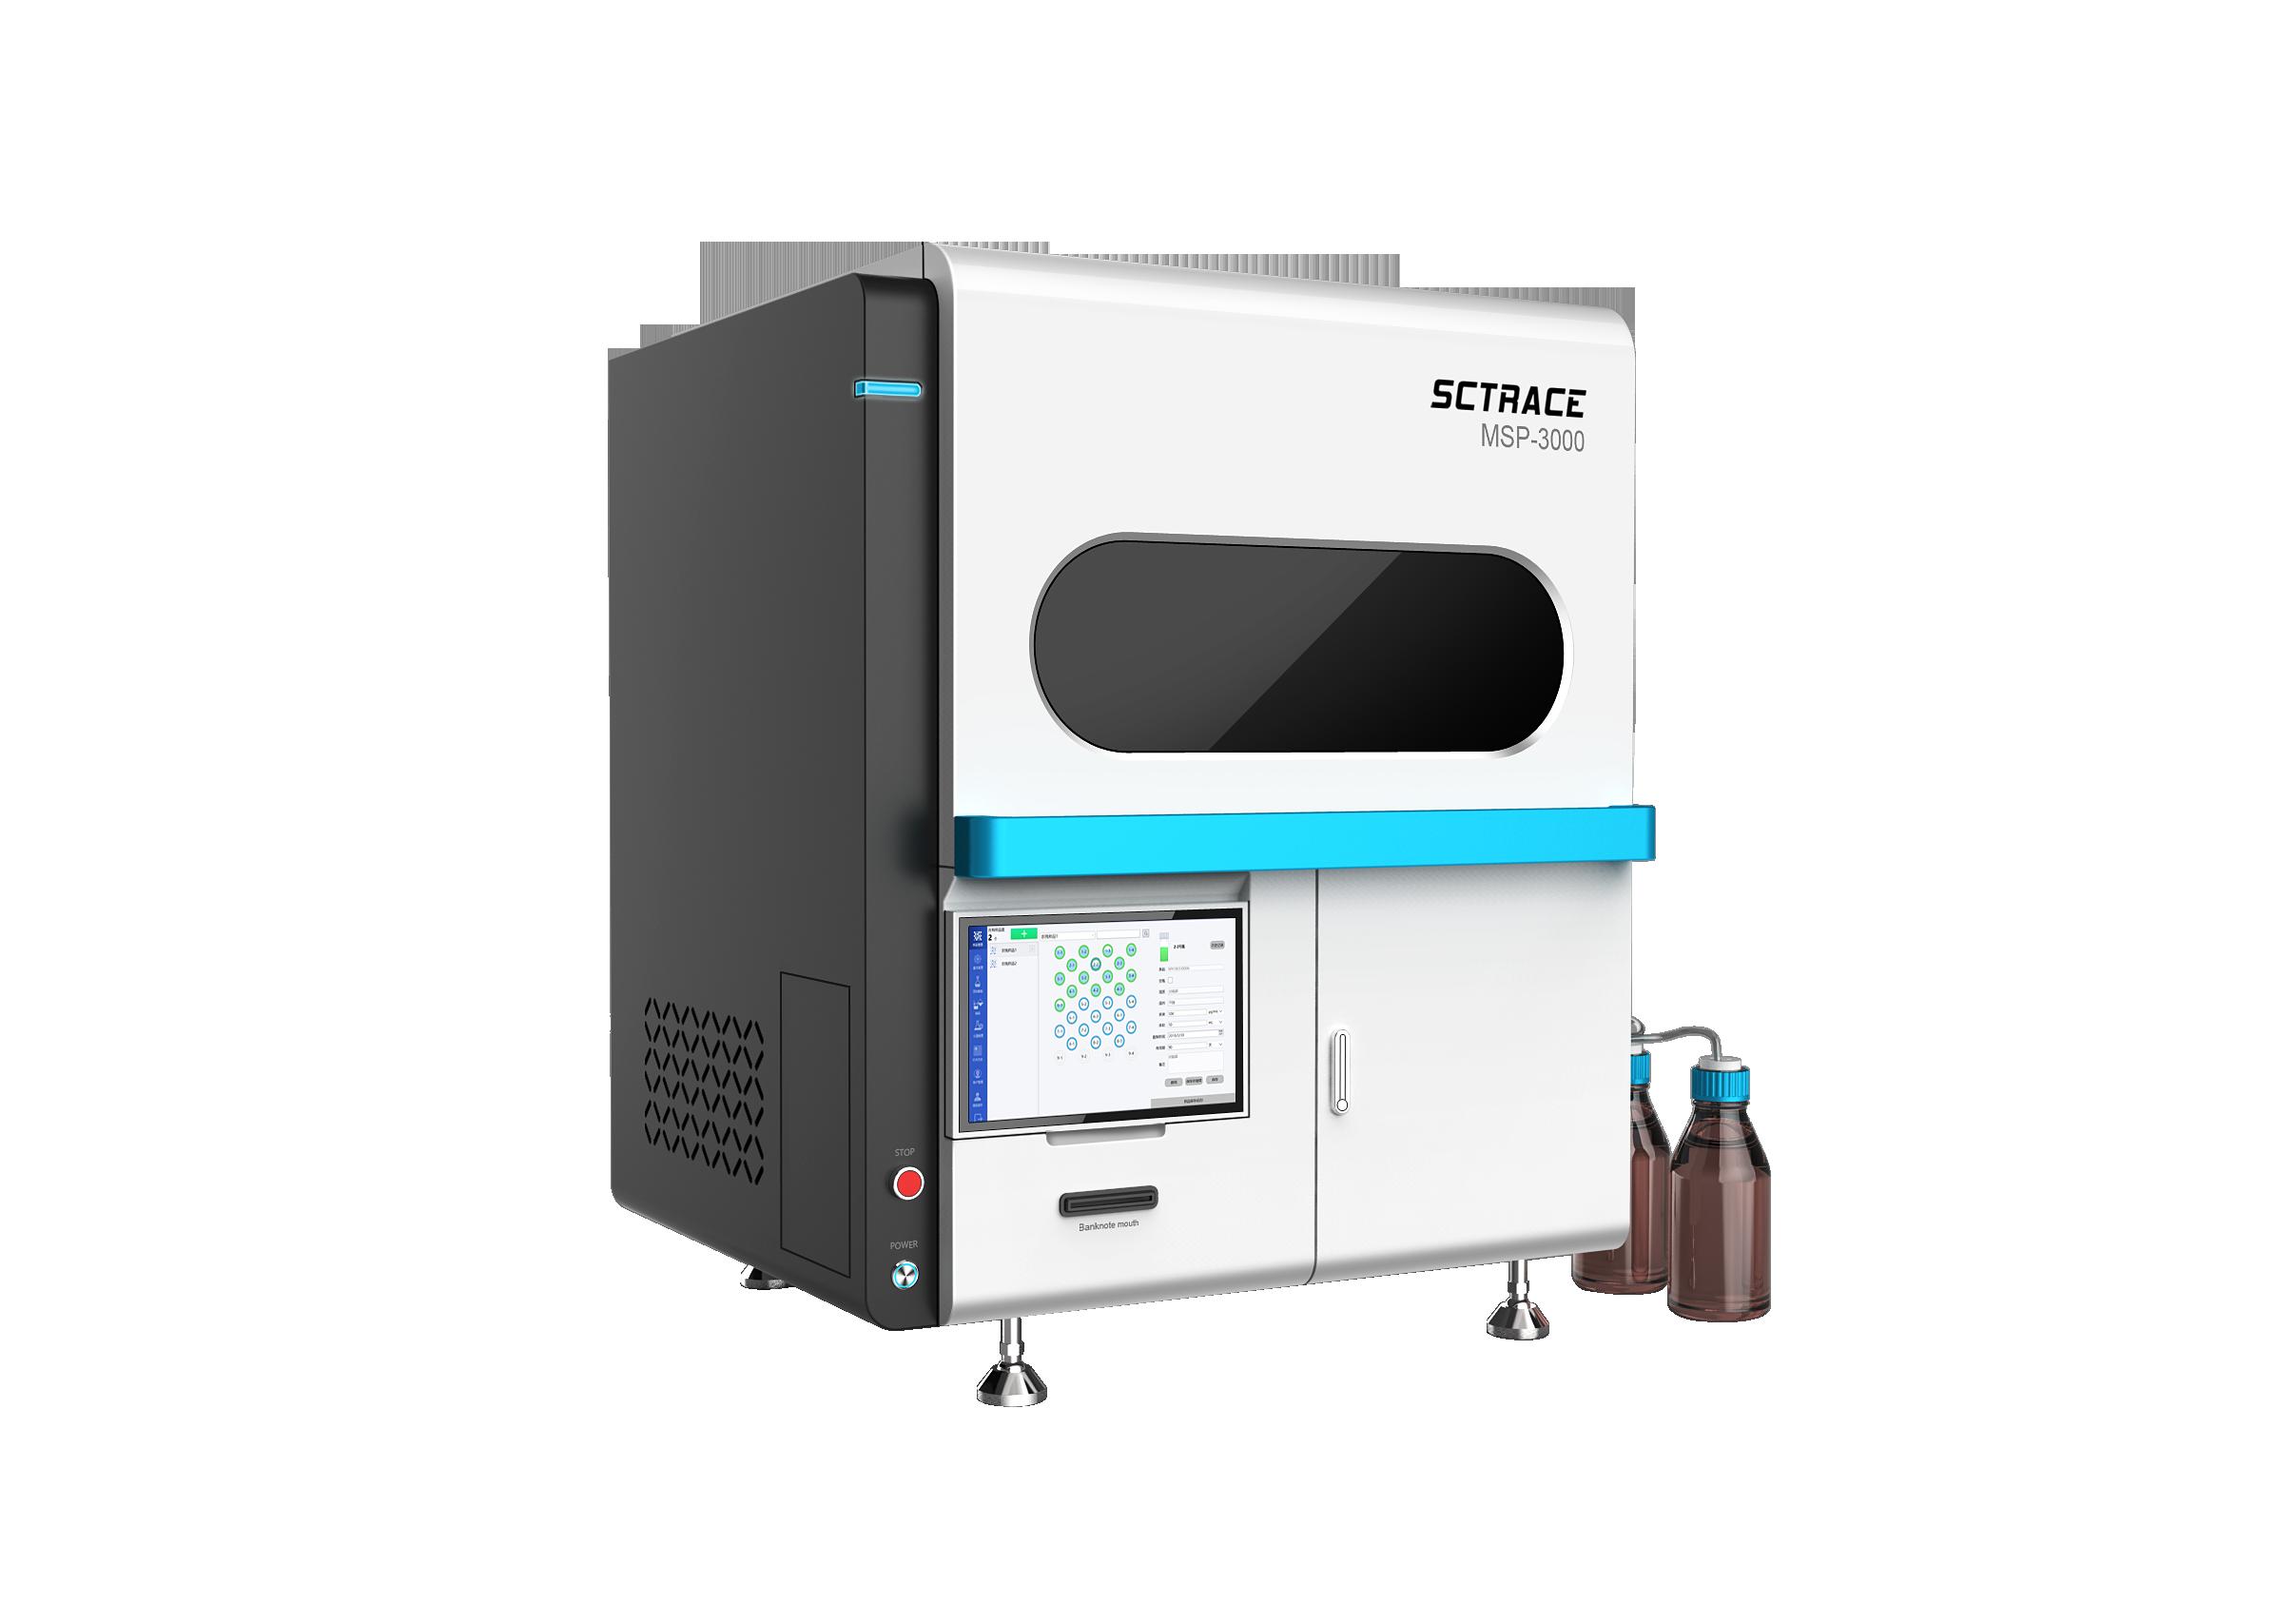 SCTRACE MSP-3000标准溶液配制机器人